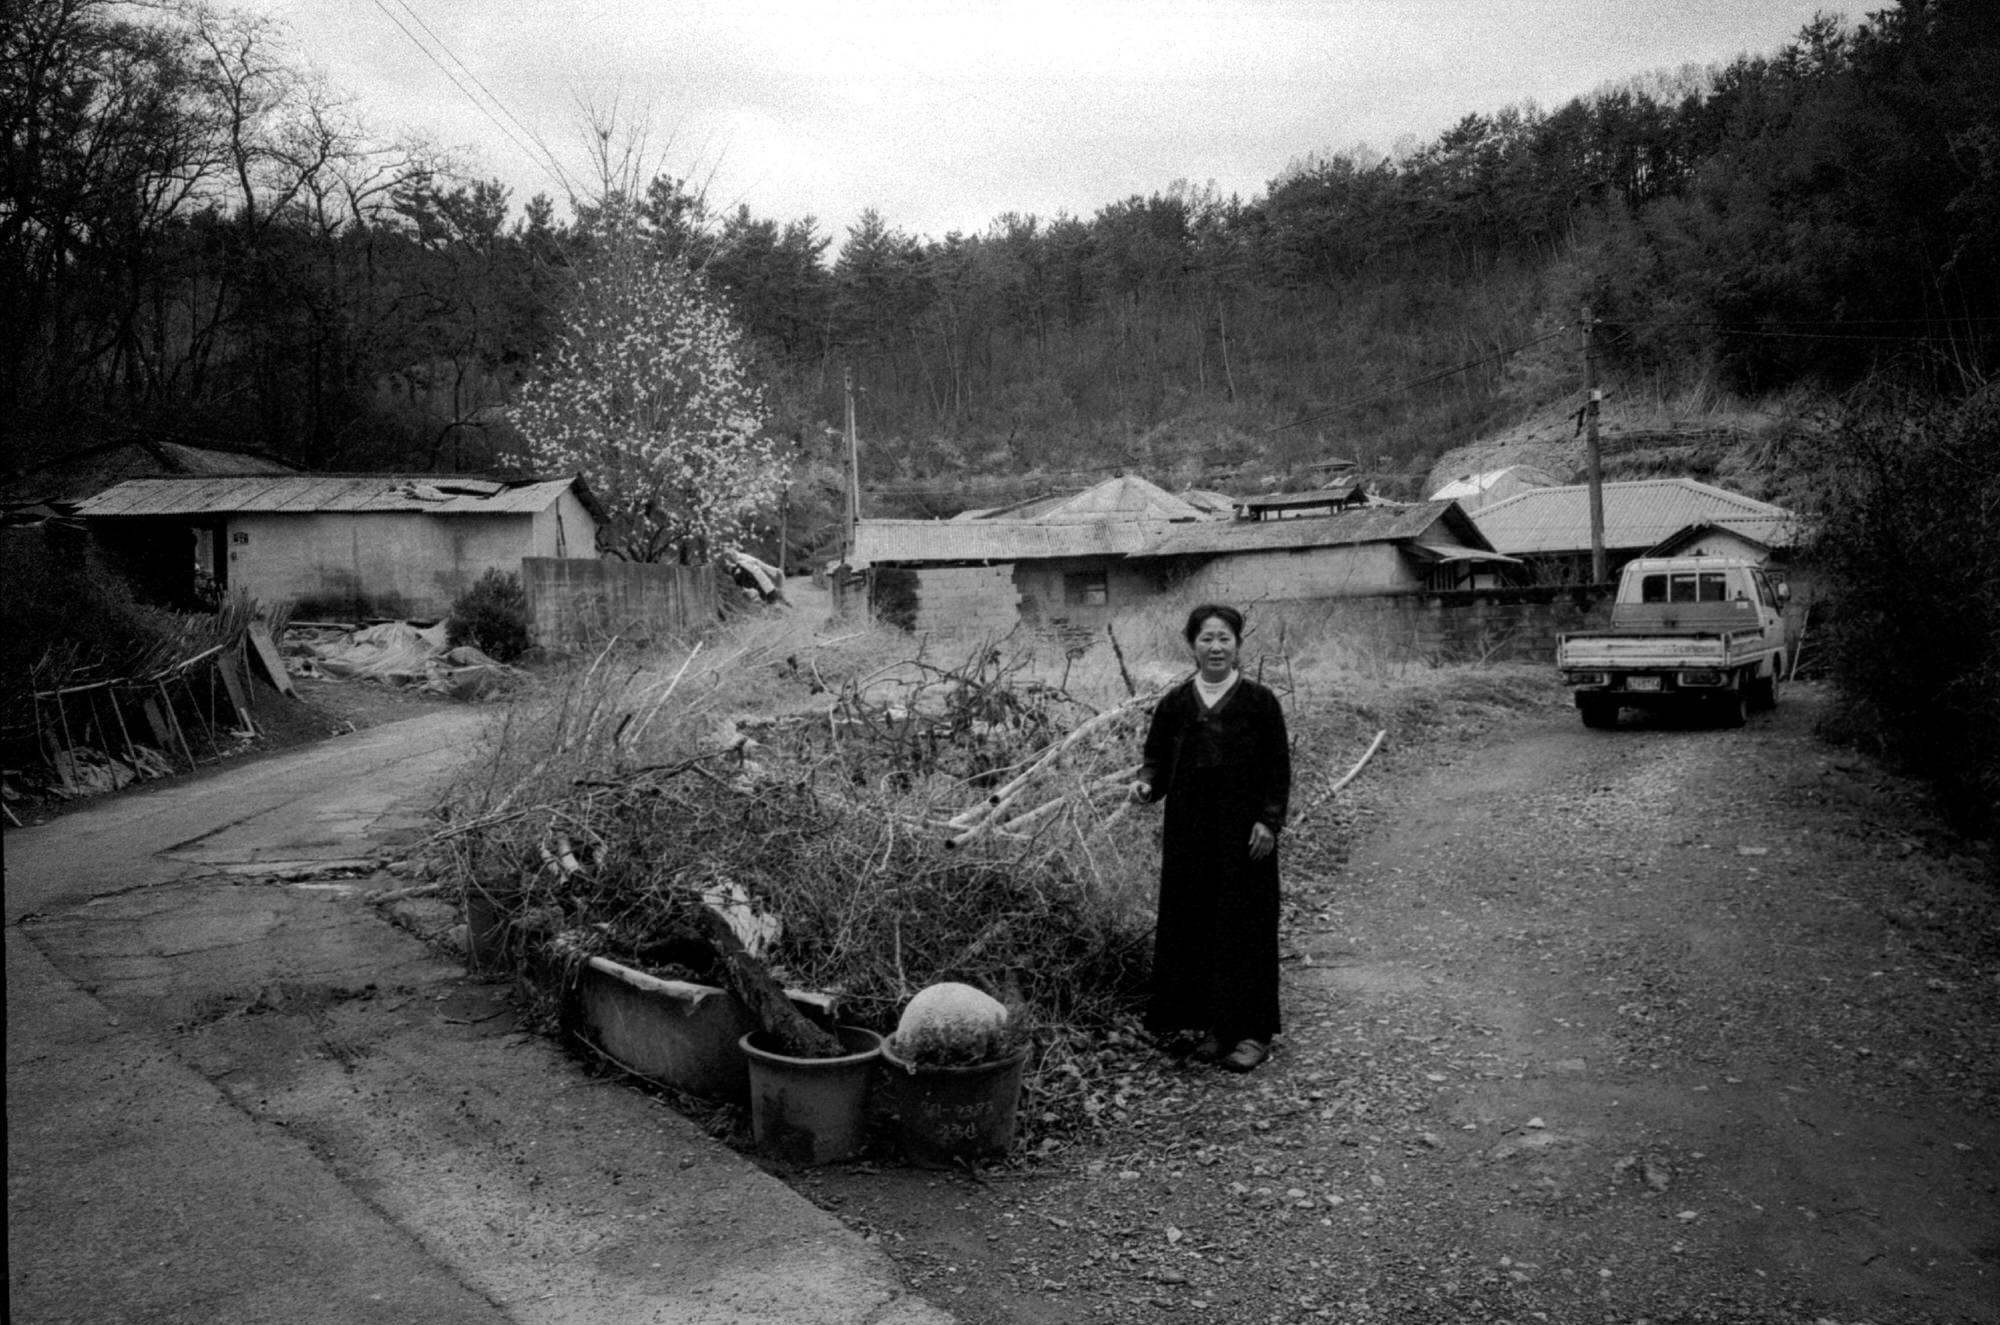 eric kim photography black and white tri x 1600 leica mp 35mm film-19